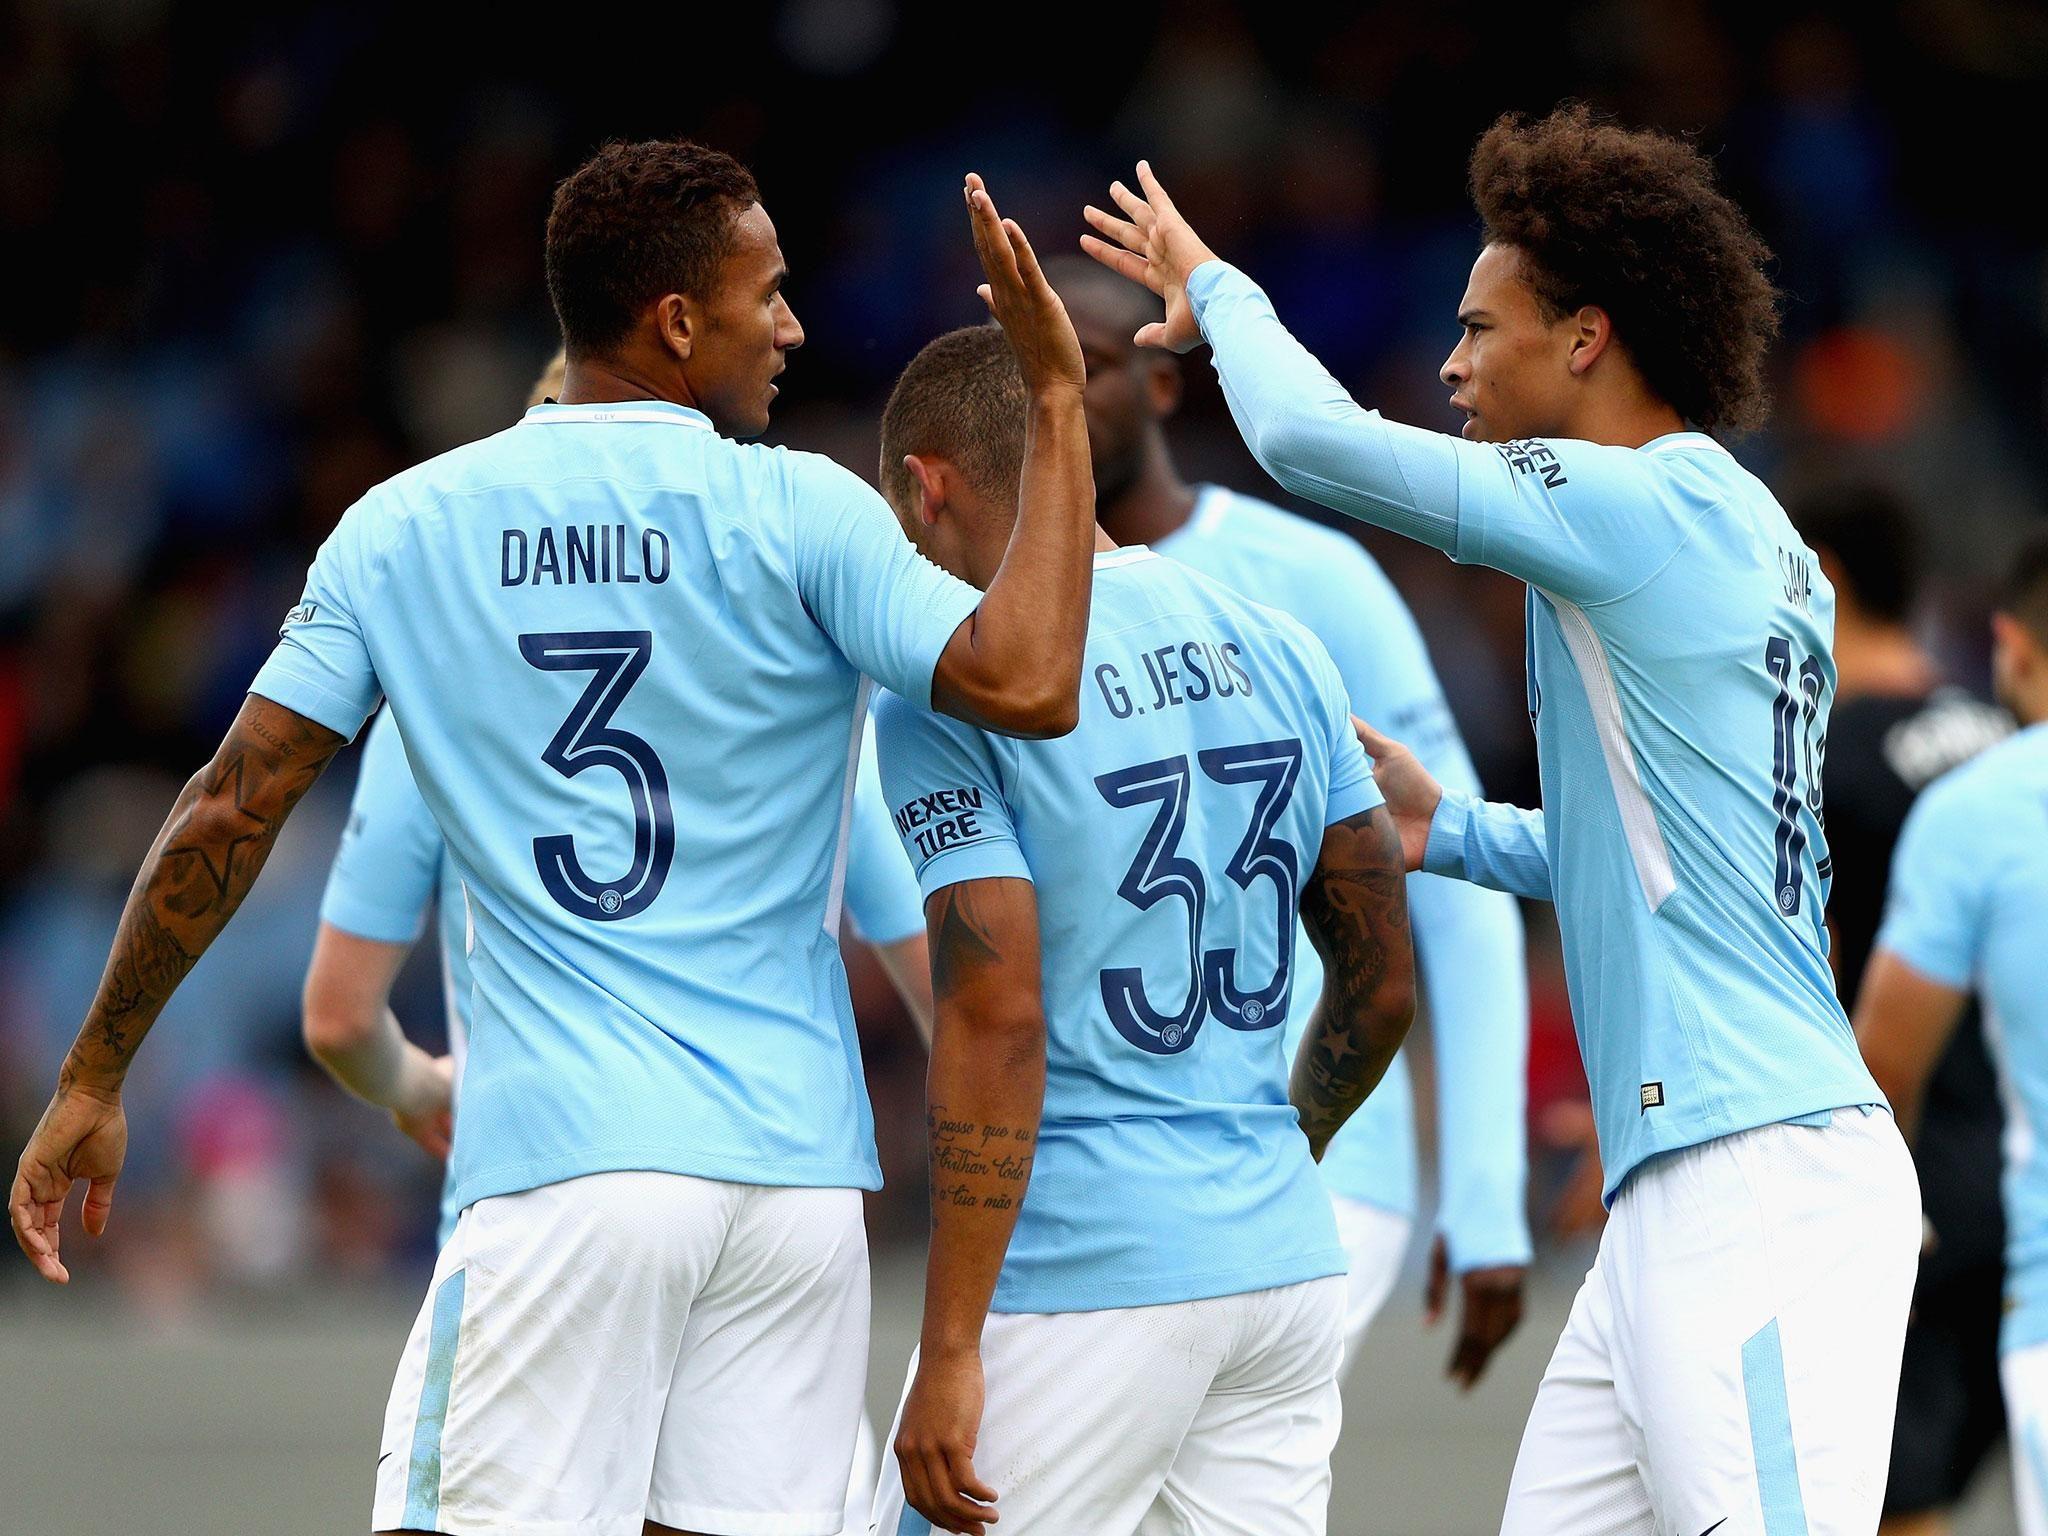 Pin oleh Markruse17 di Manchester City di 2020 Liga